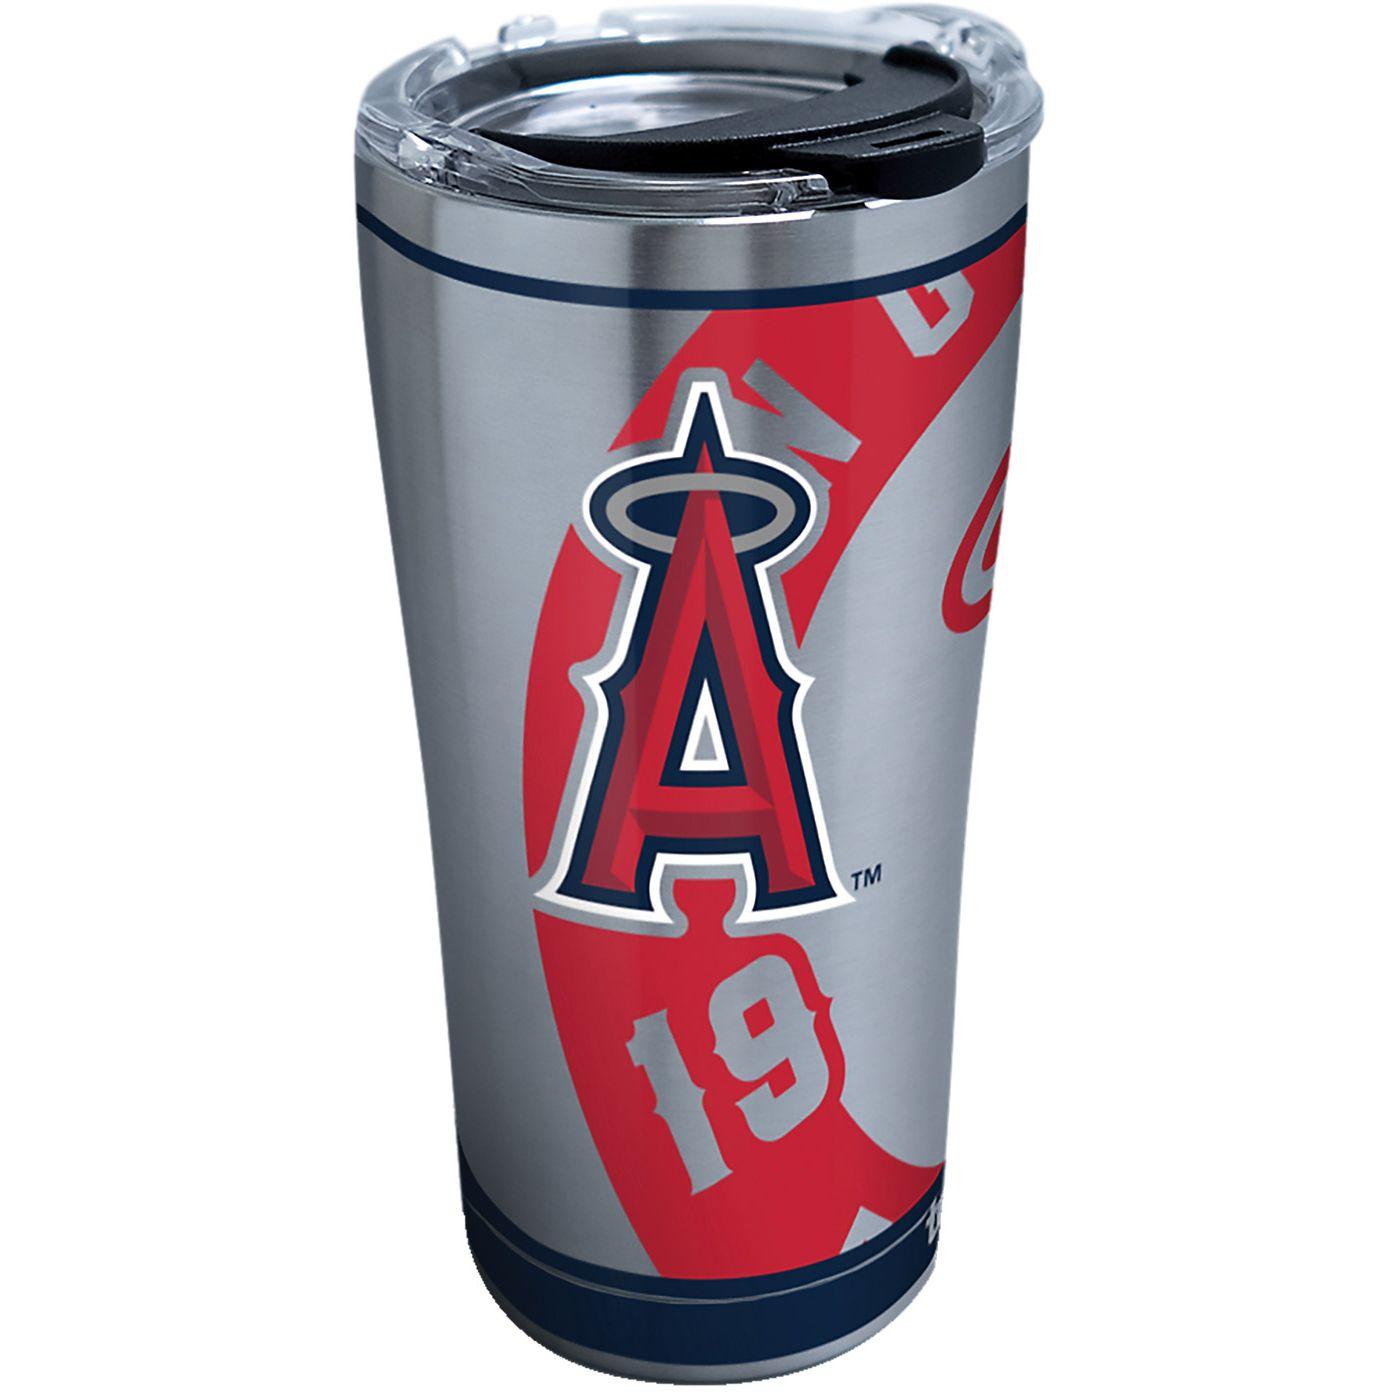 Tervis Los Angeles Angels 20oz. Stainless Steel Tumbler